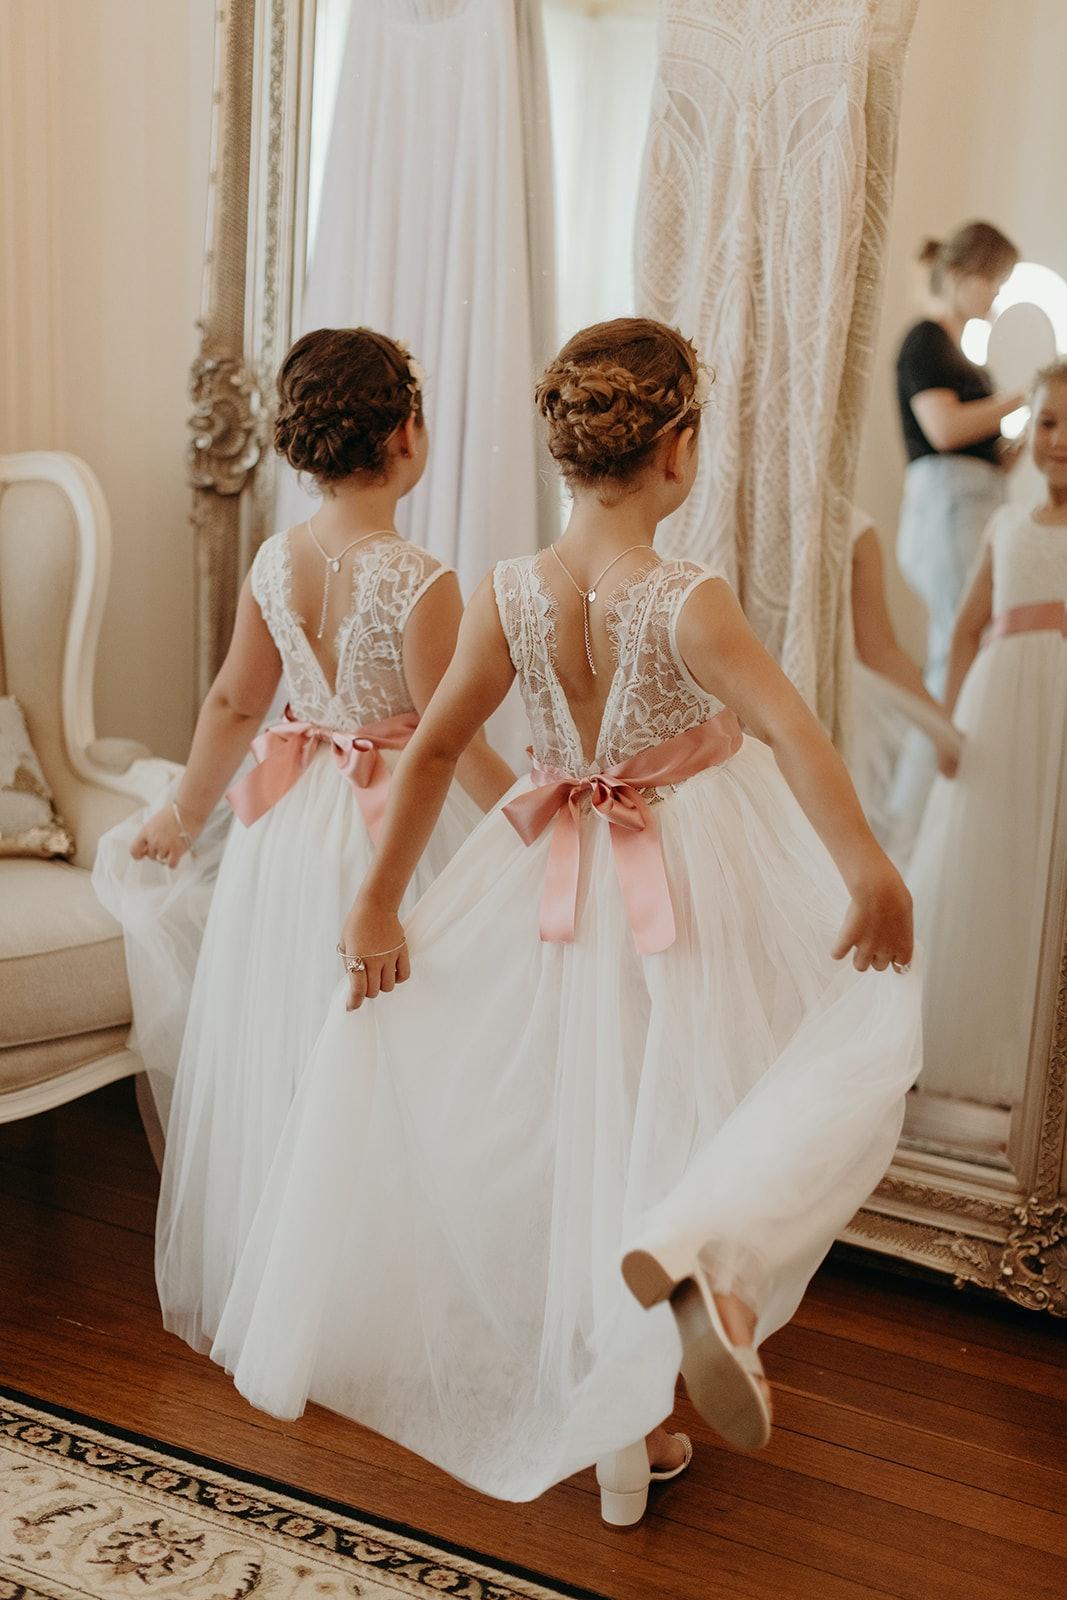 Flowergirls standing in front of mirror